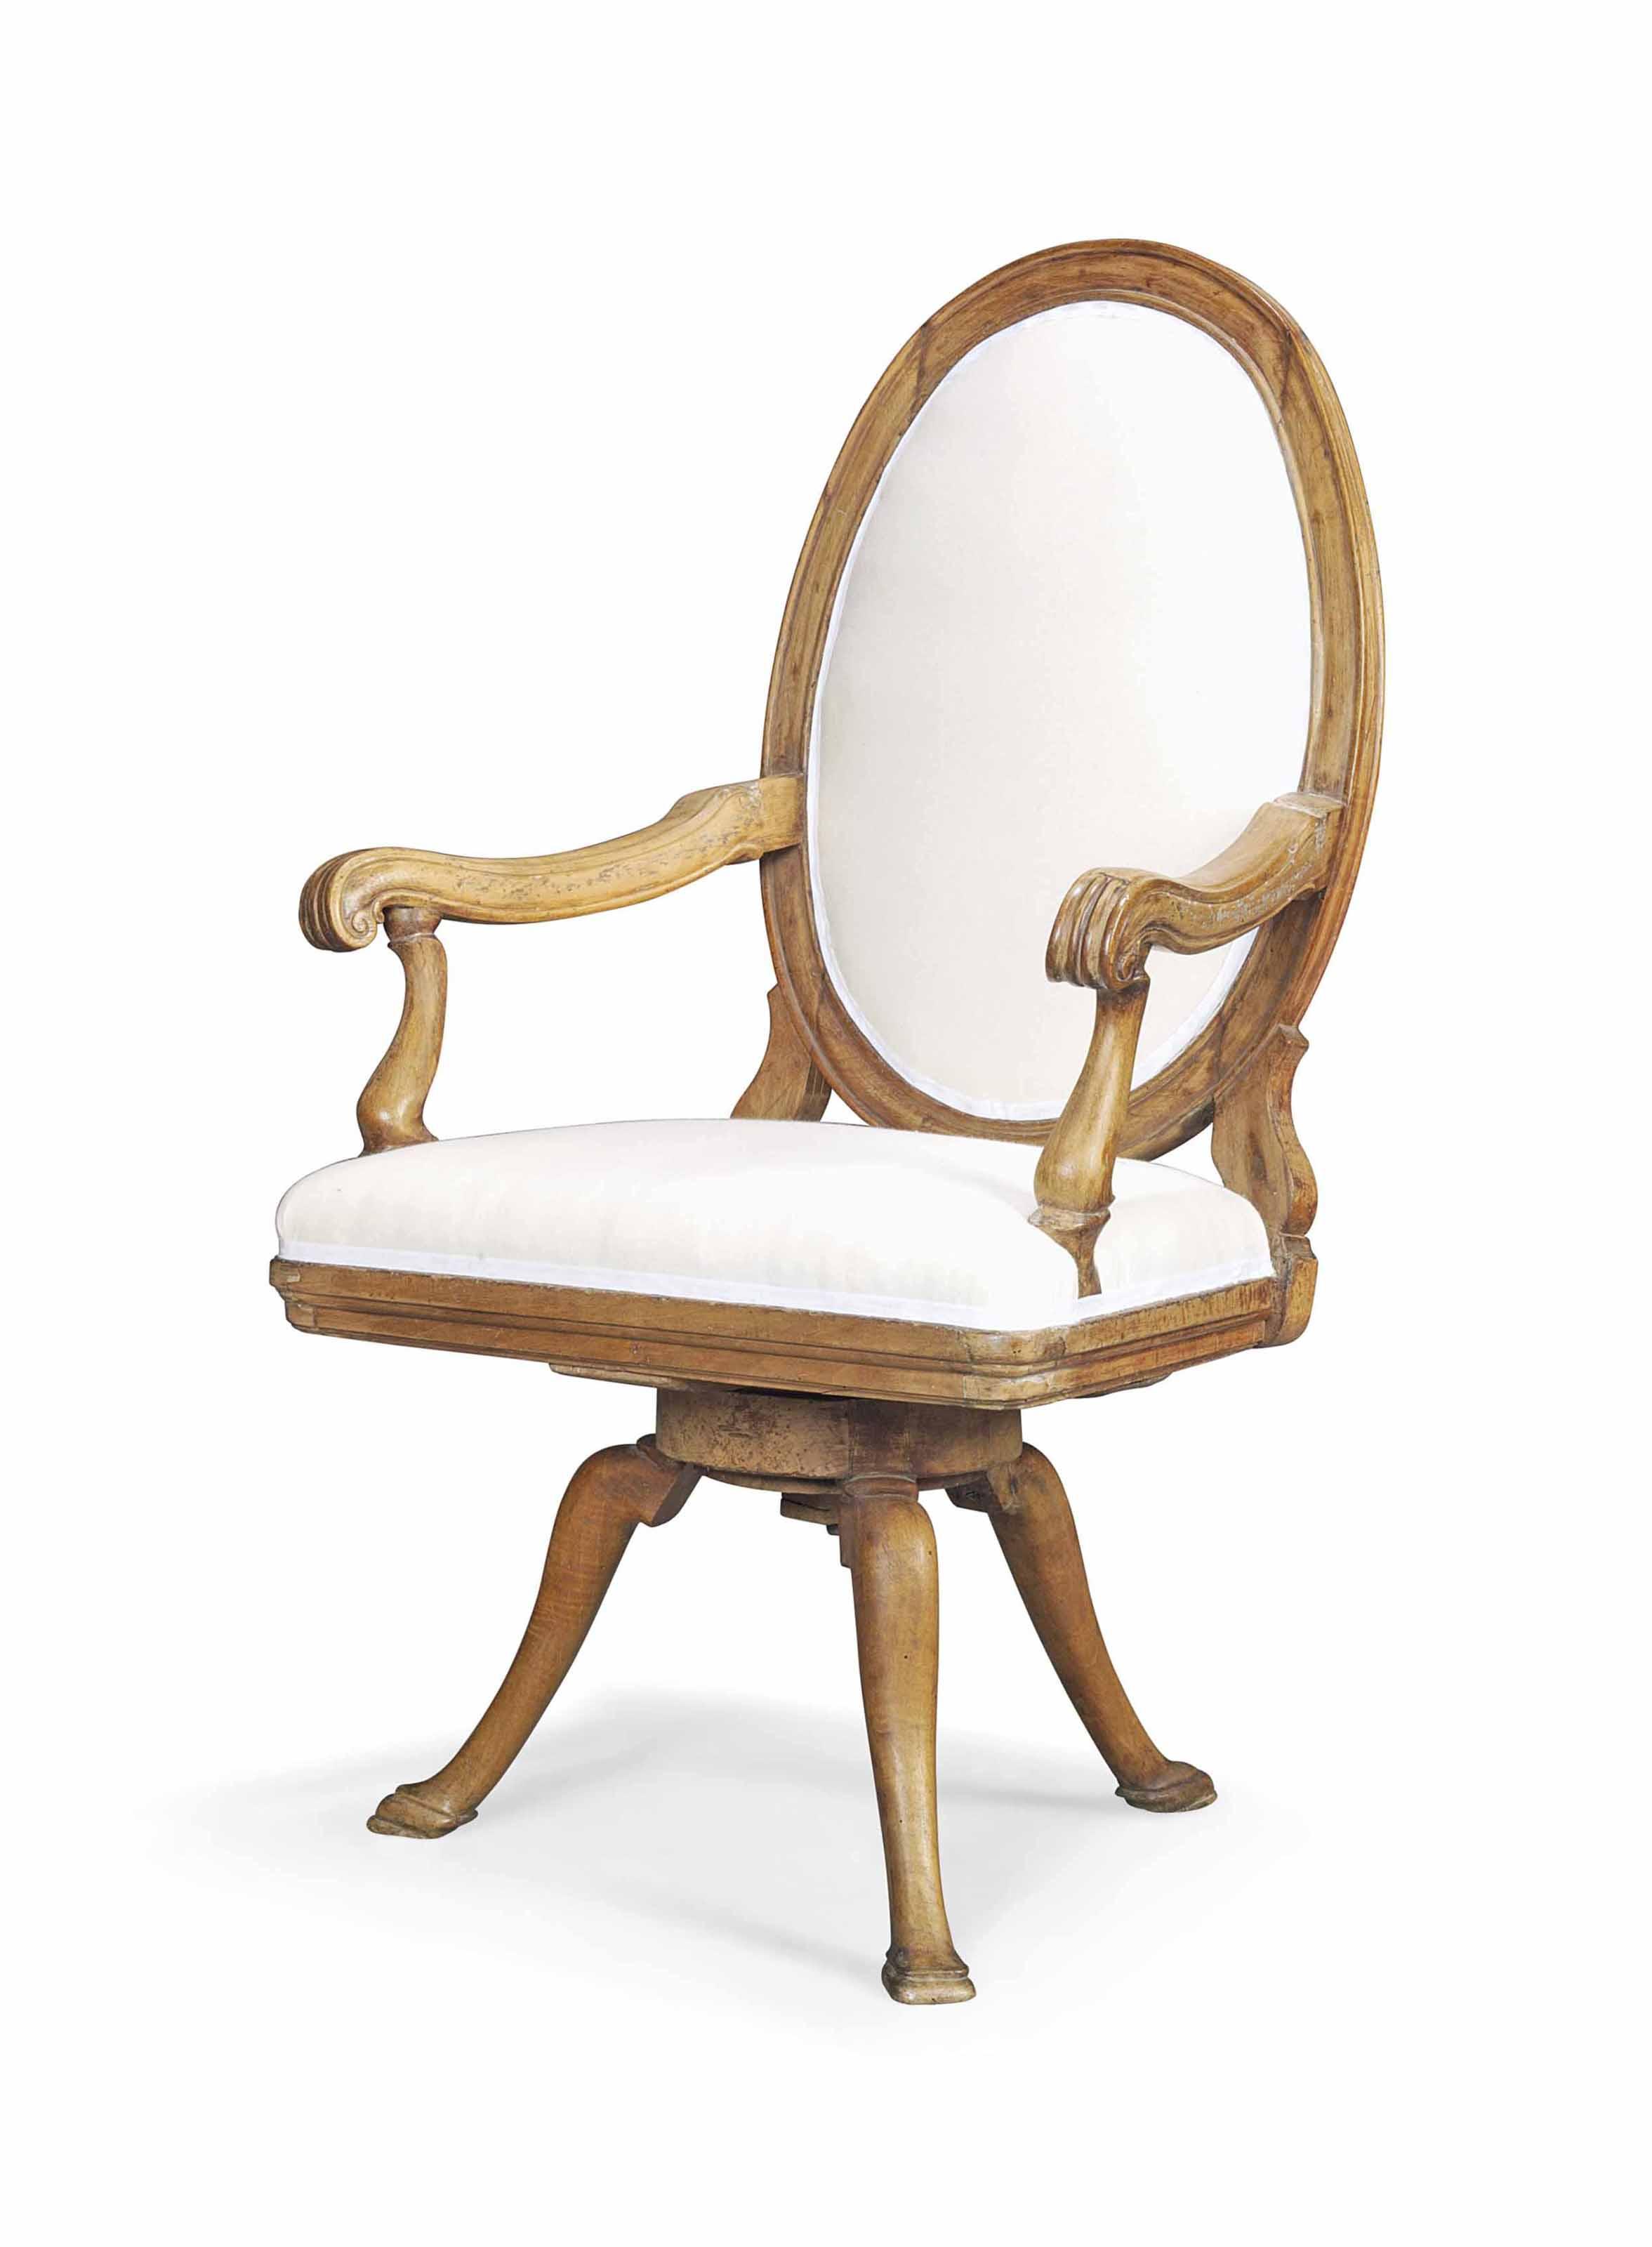 revolving chair rate king san antonio a north italian walnut library late 18th